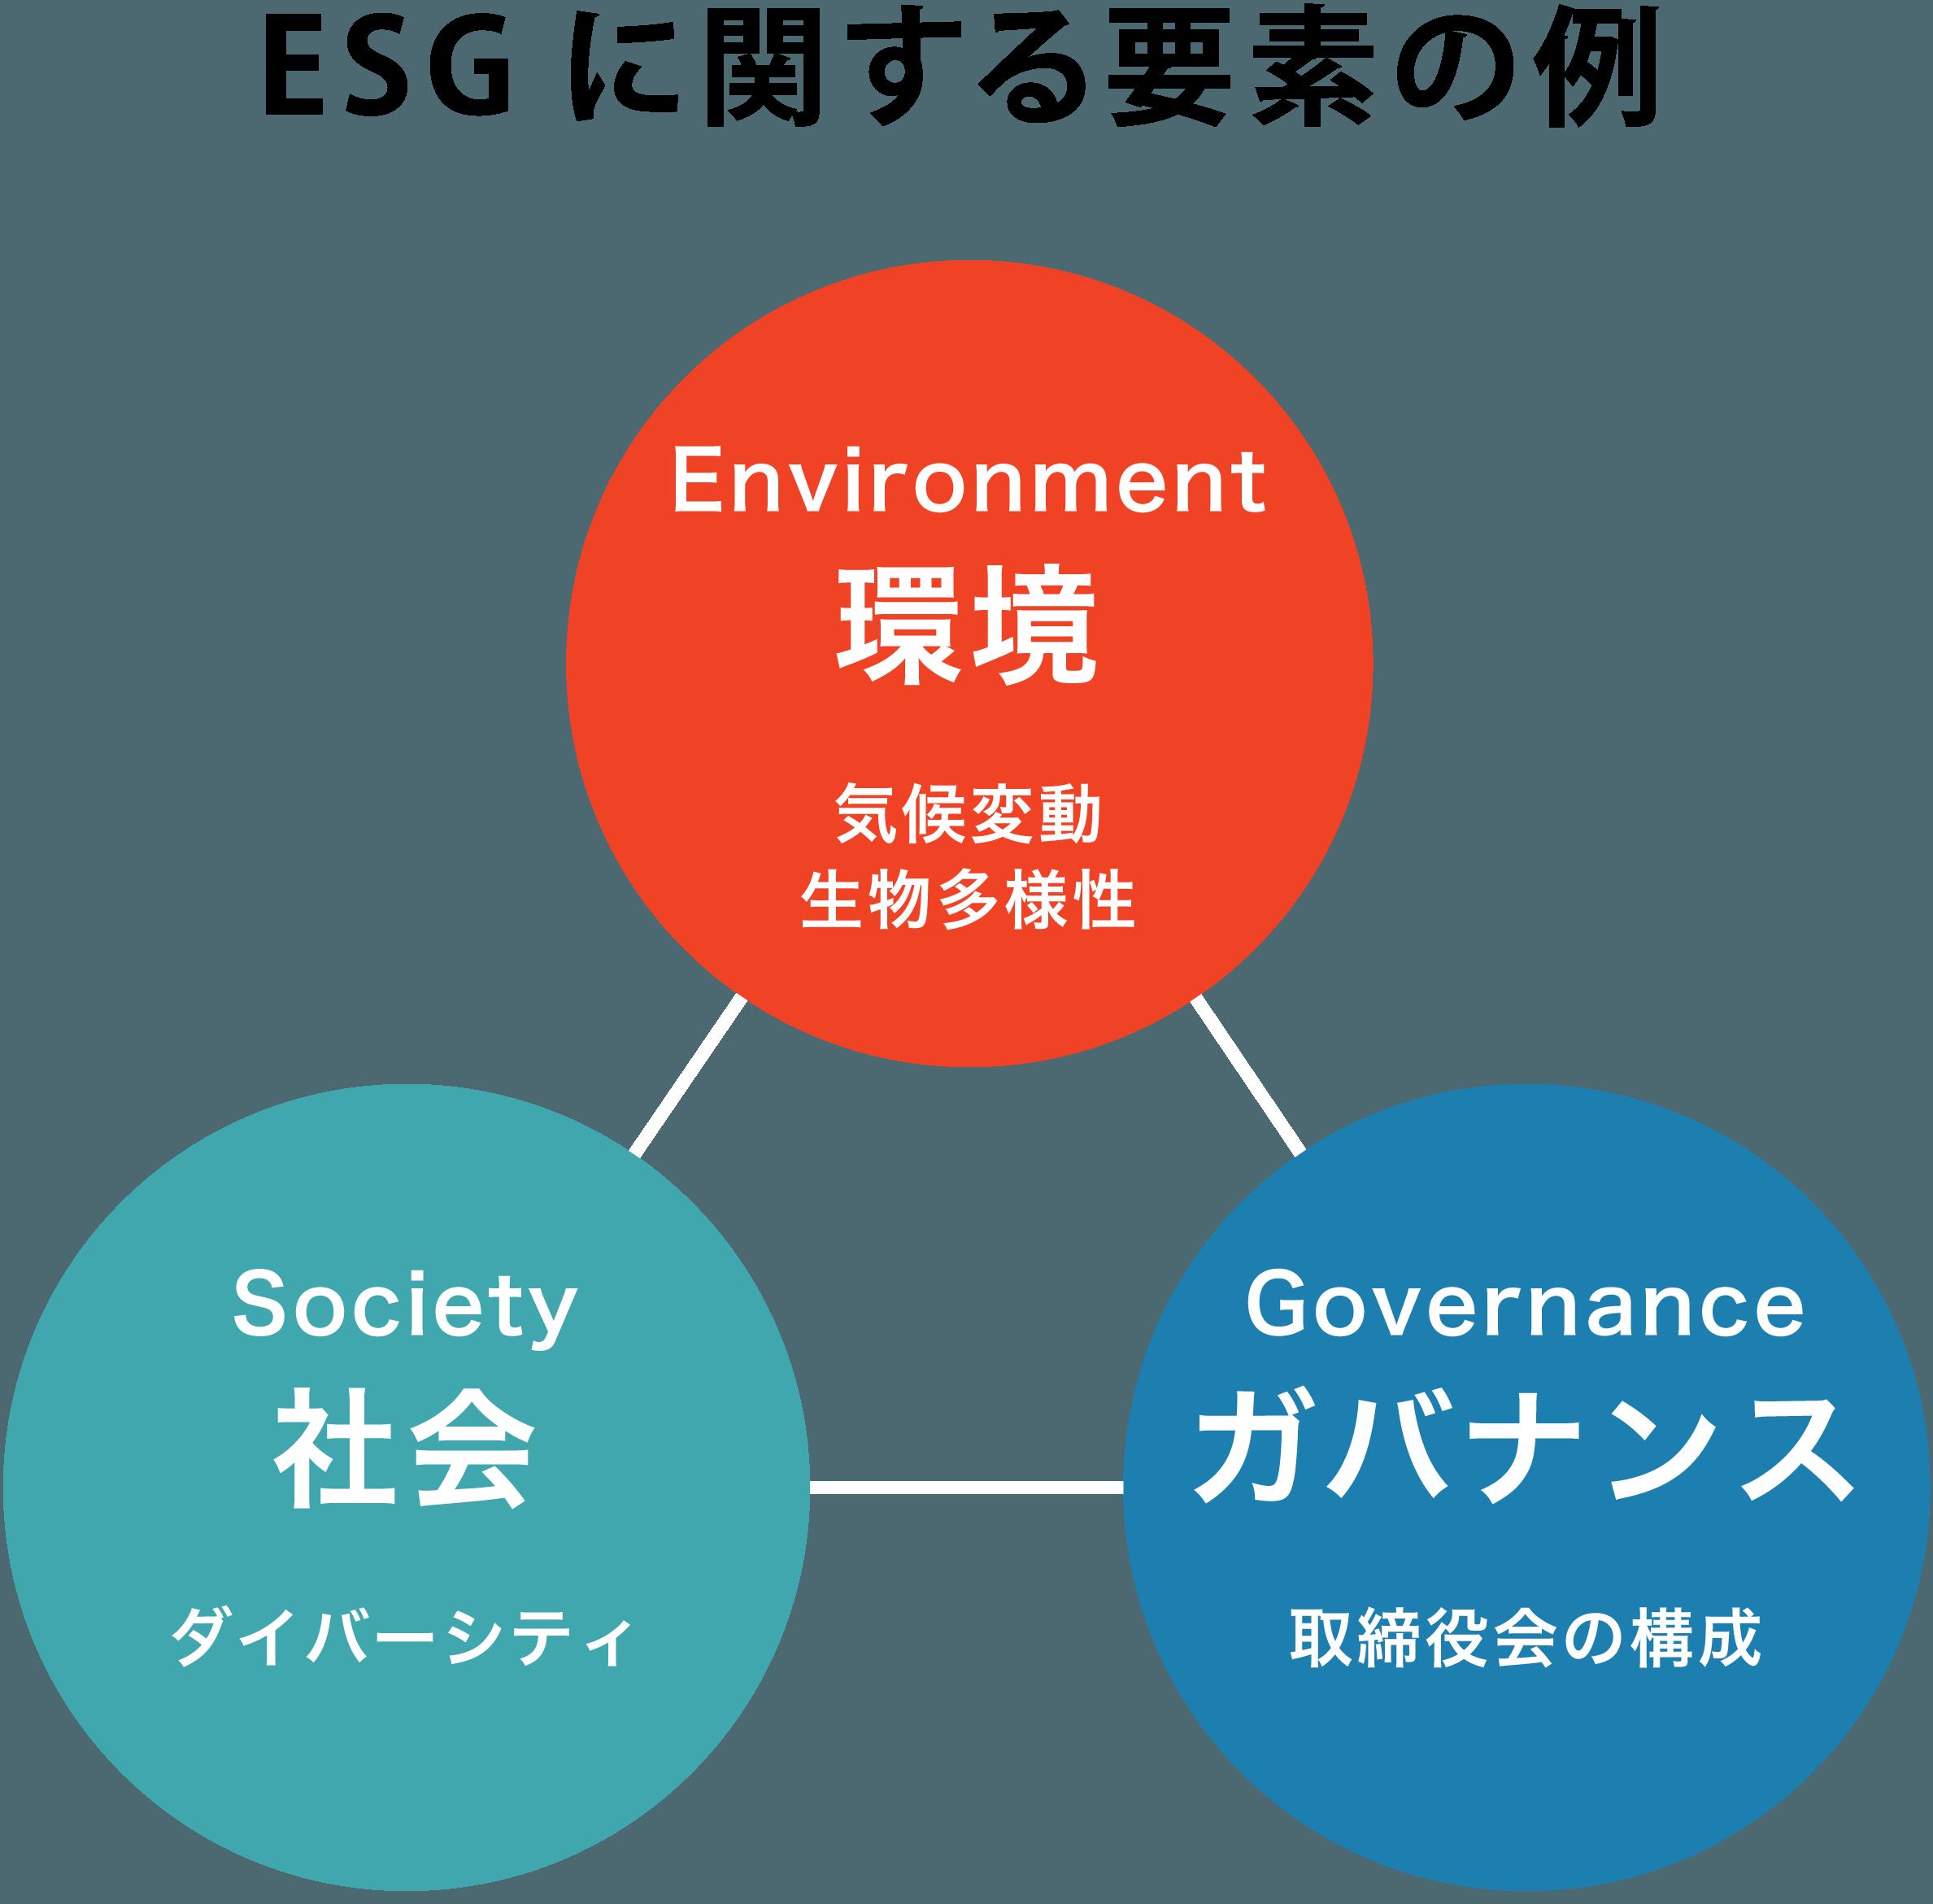 ESGに関する要素の例